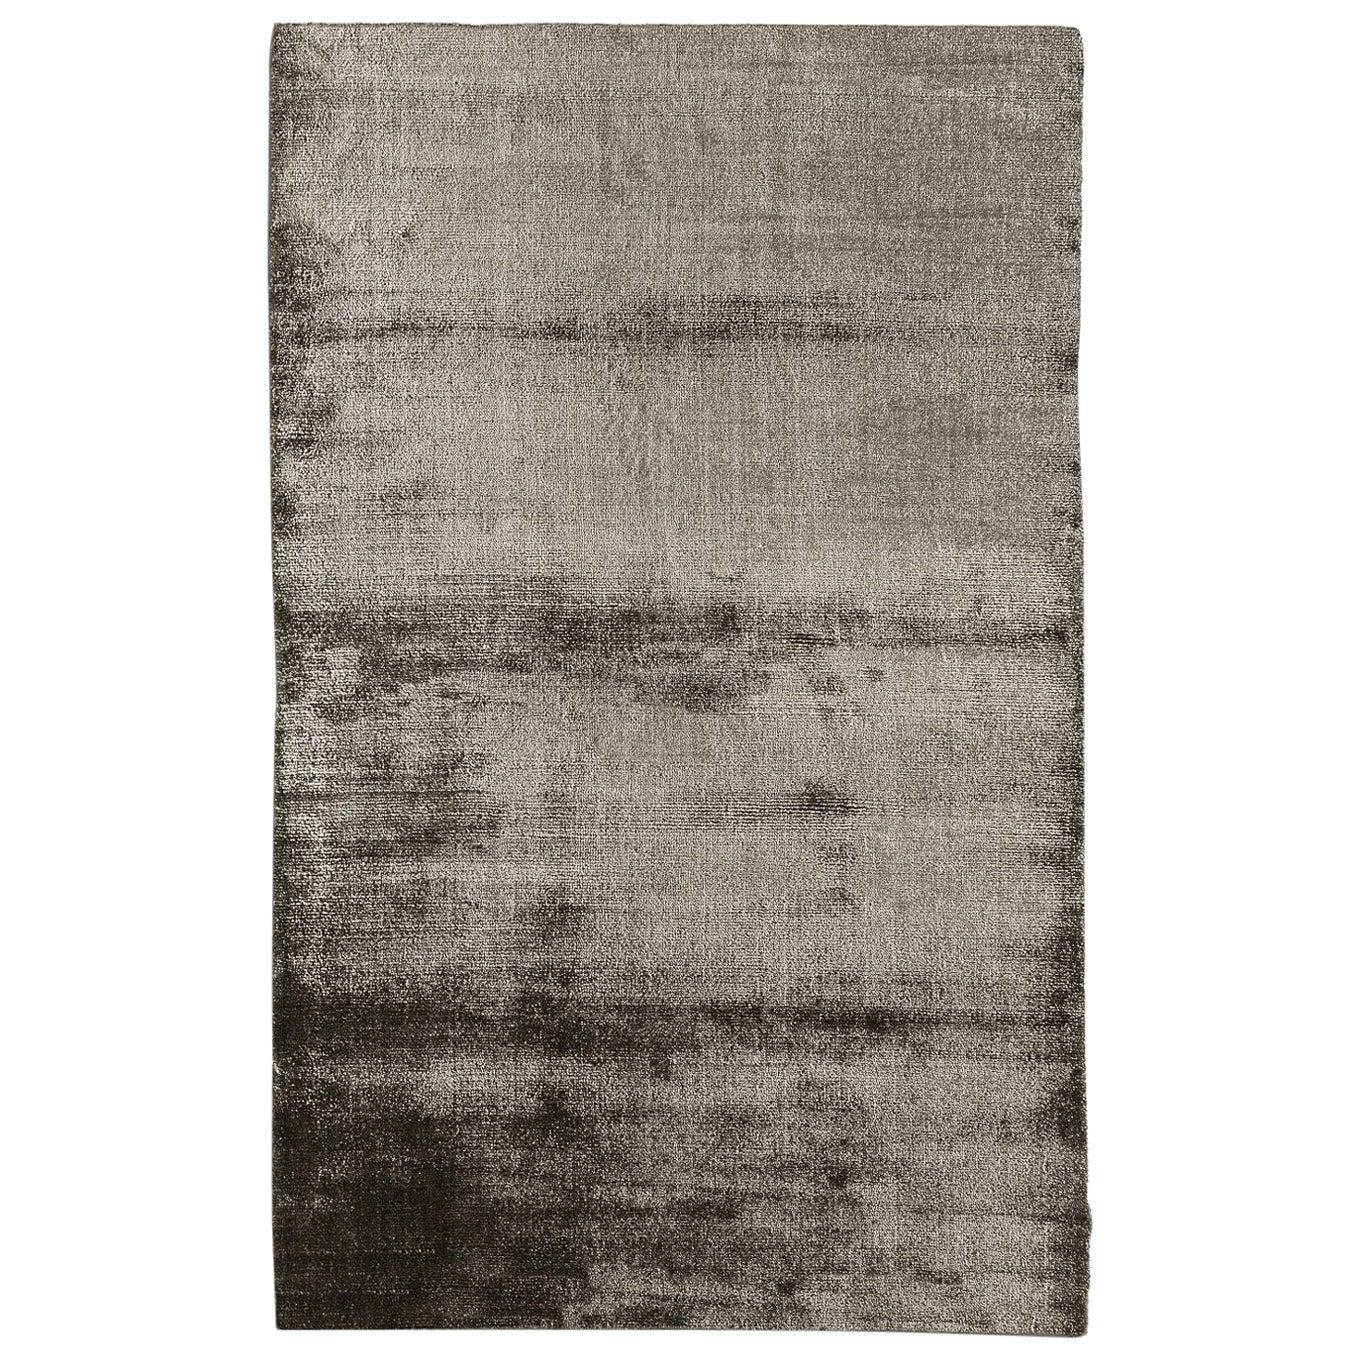 Kama Viscose Shiny Velvetly Rug by Deanna Comellini 200x300 cm